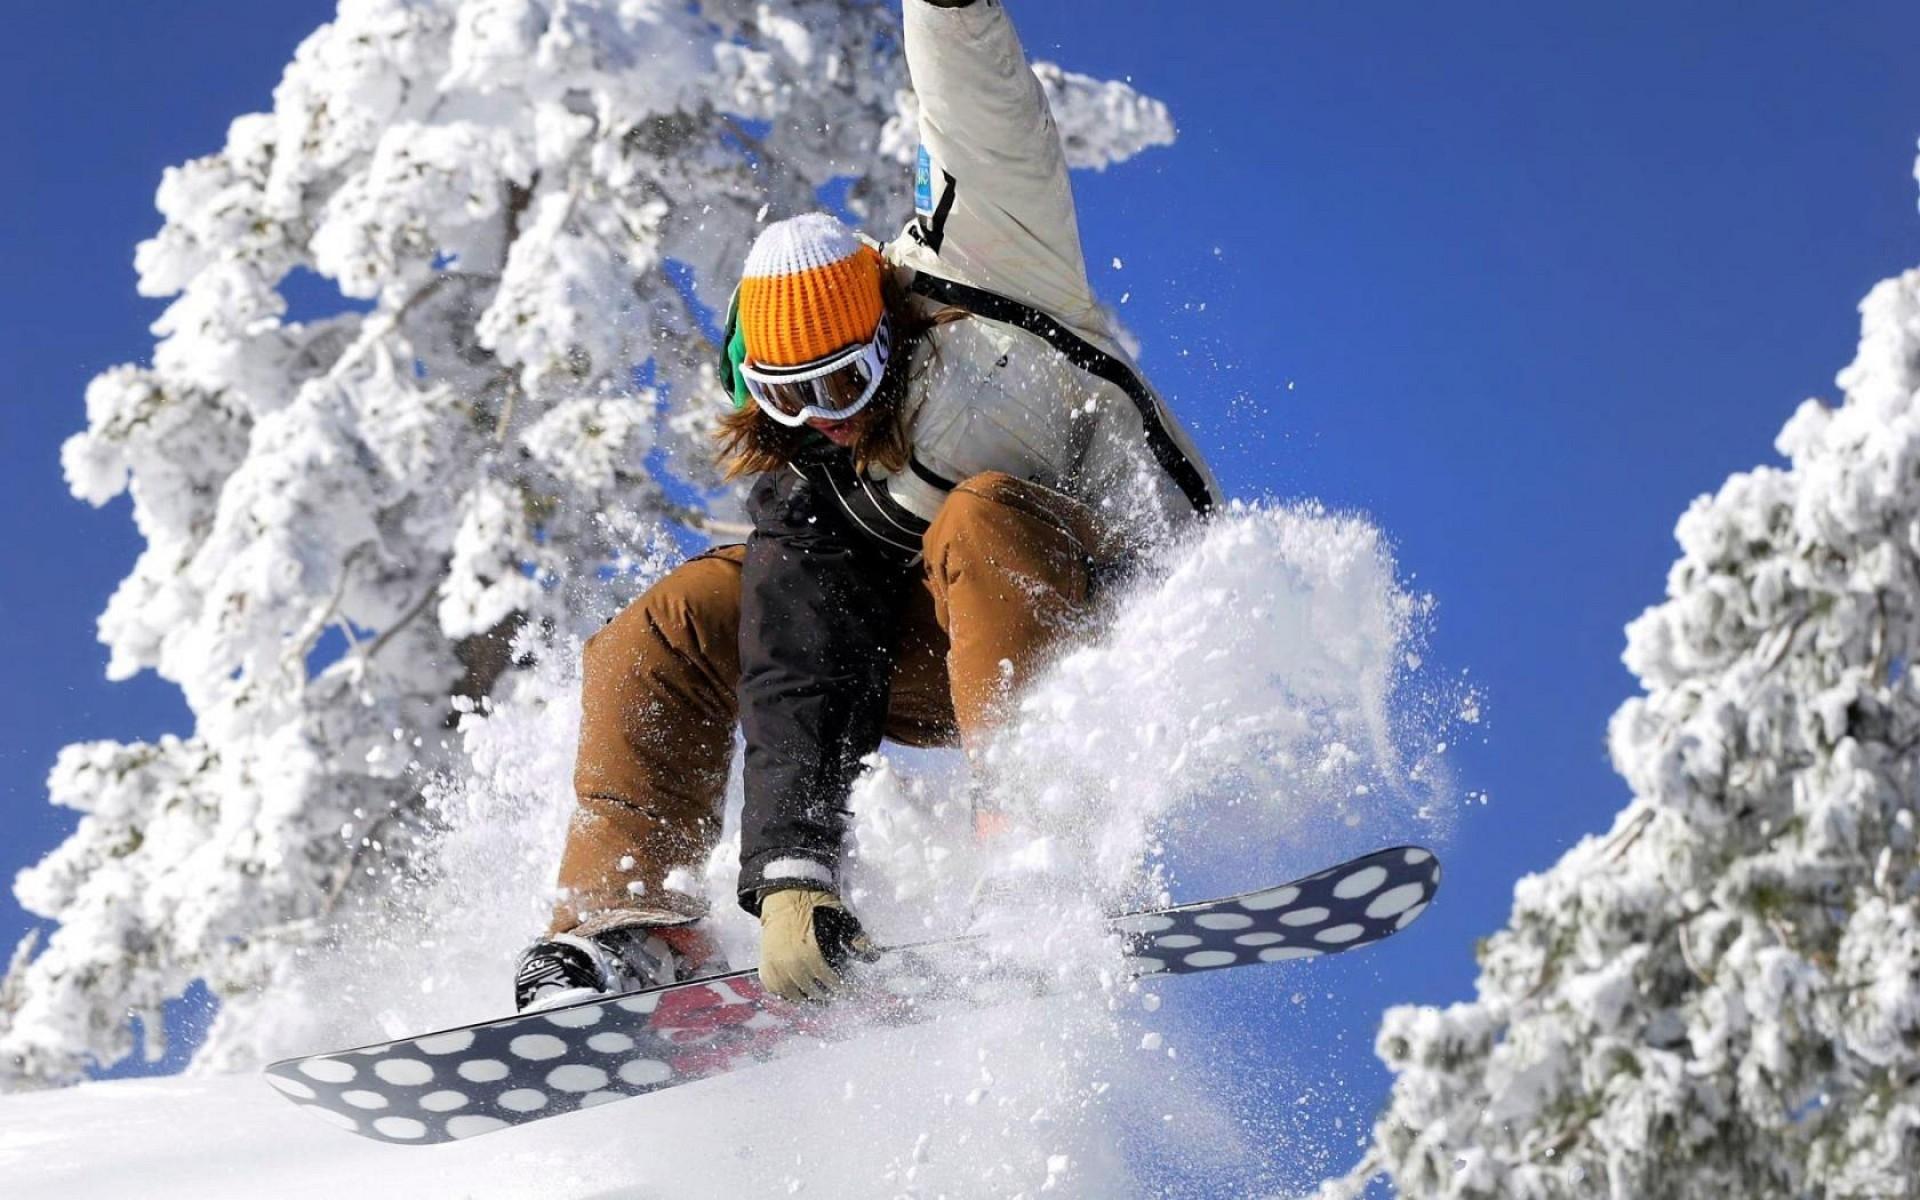 Вологда готова к фестивалю зимних видов спорта